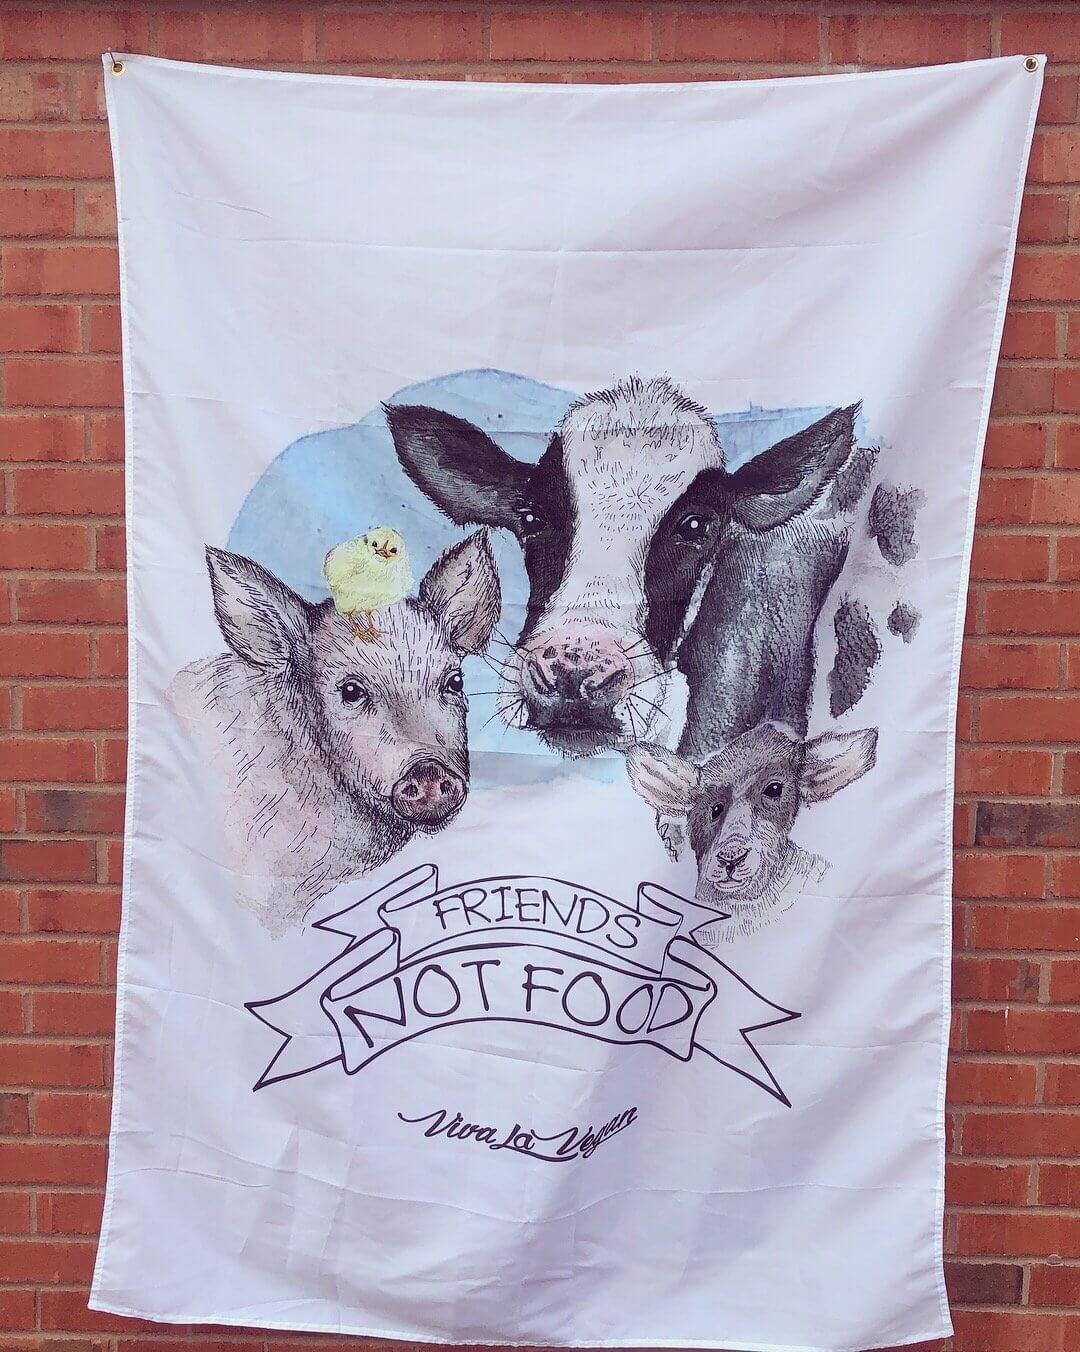 Statement Flag: Friends not food